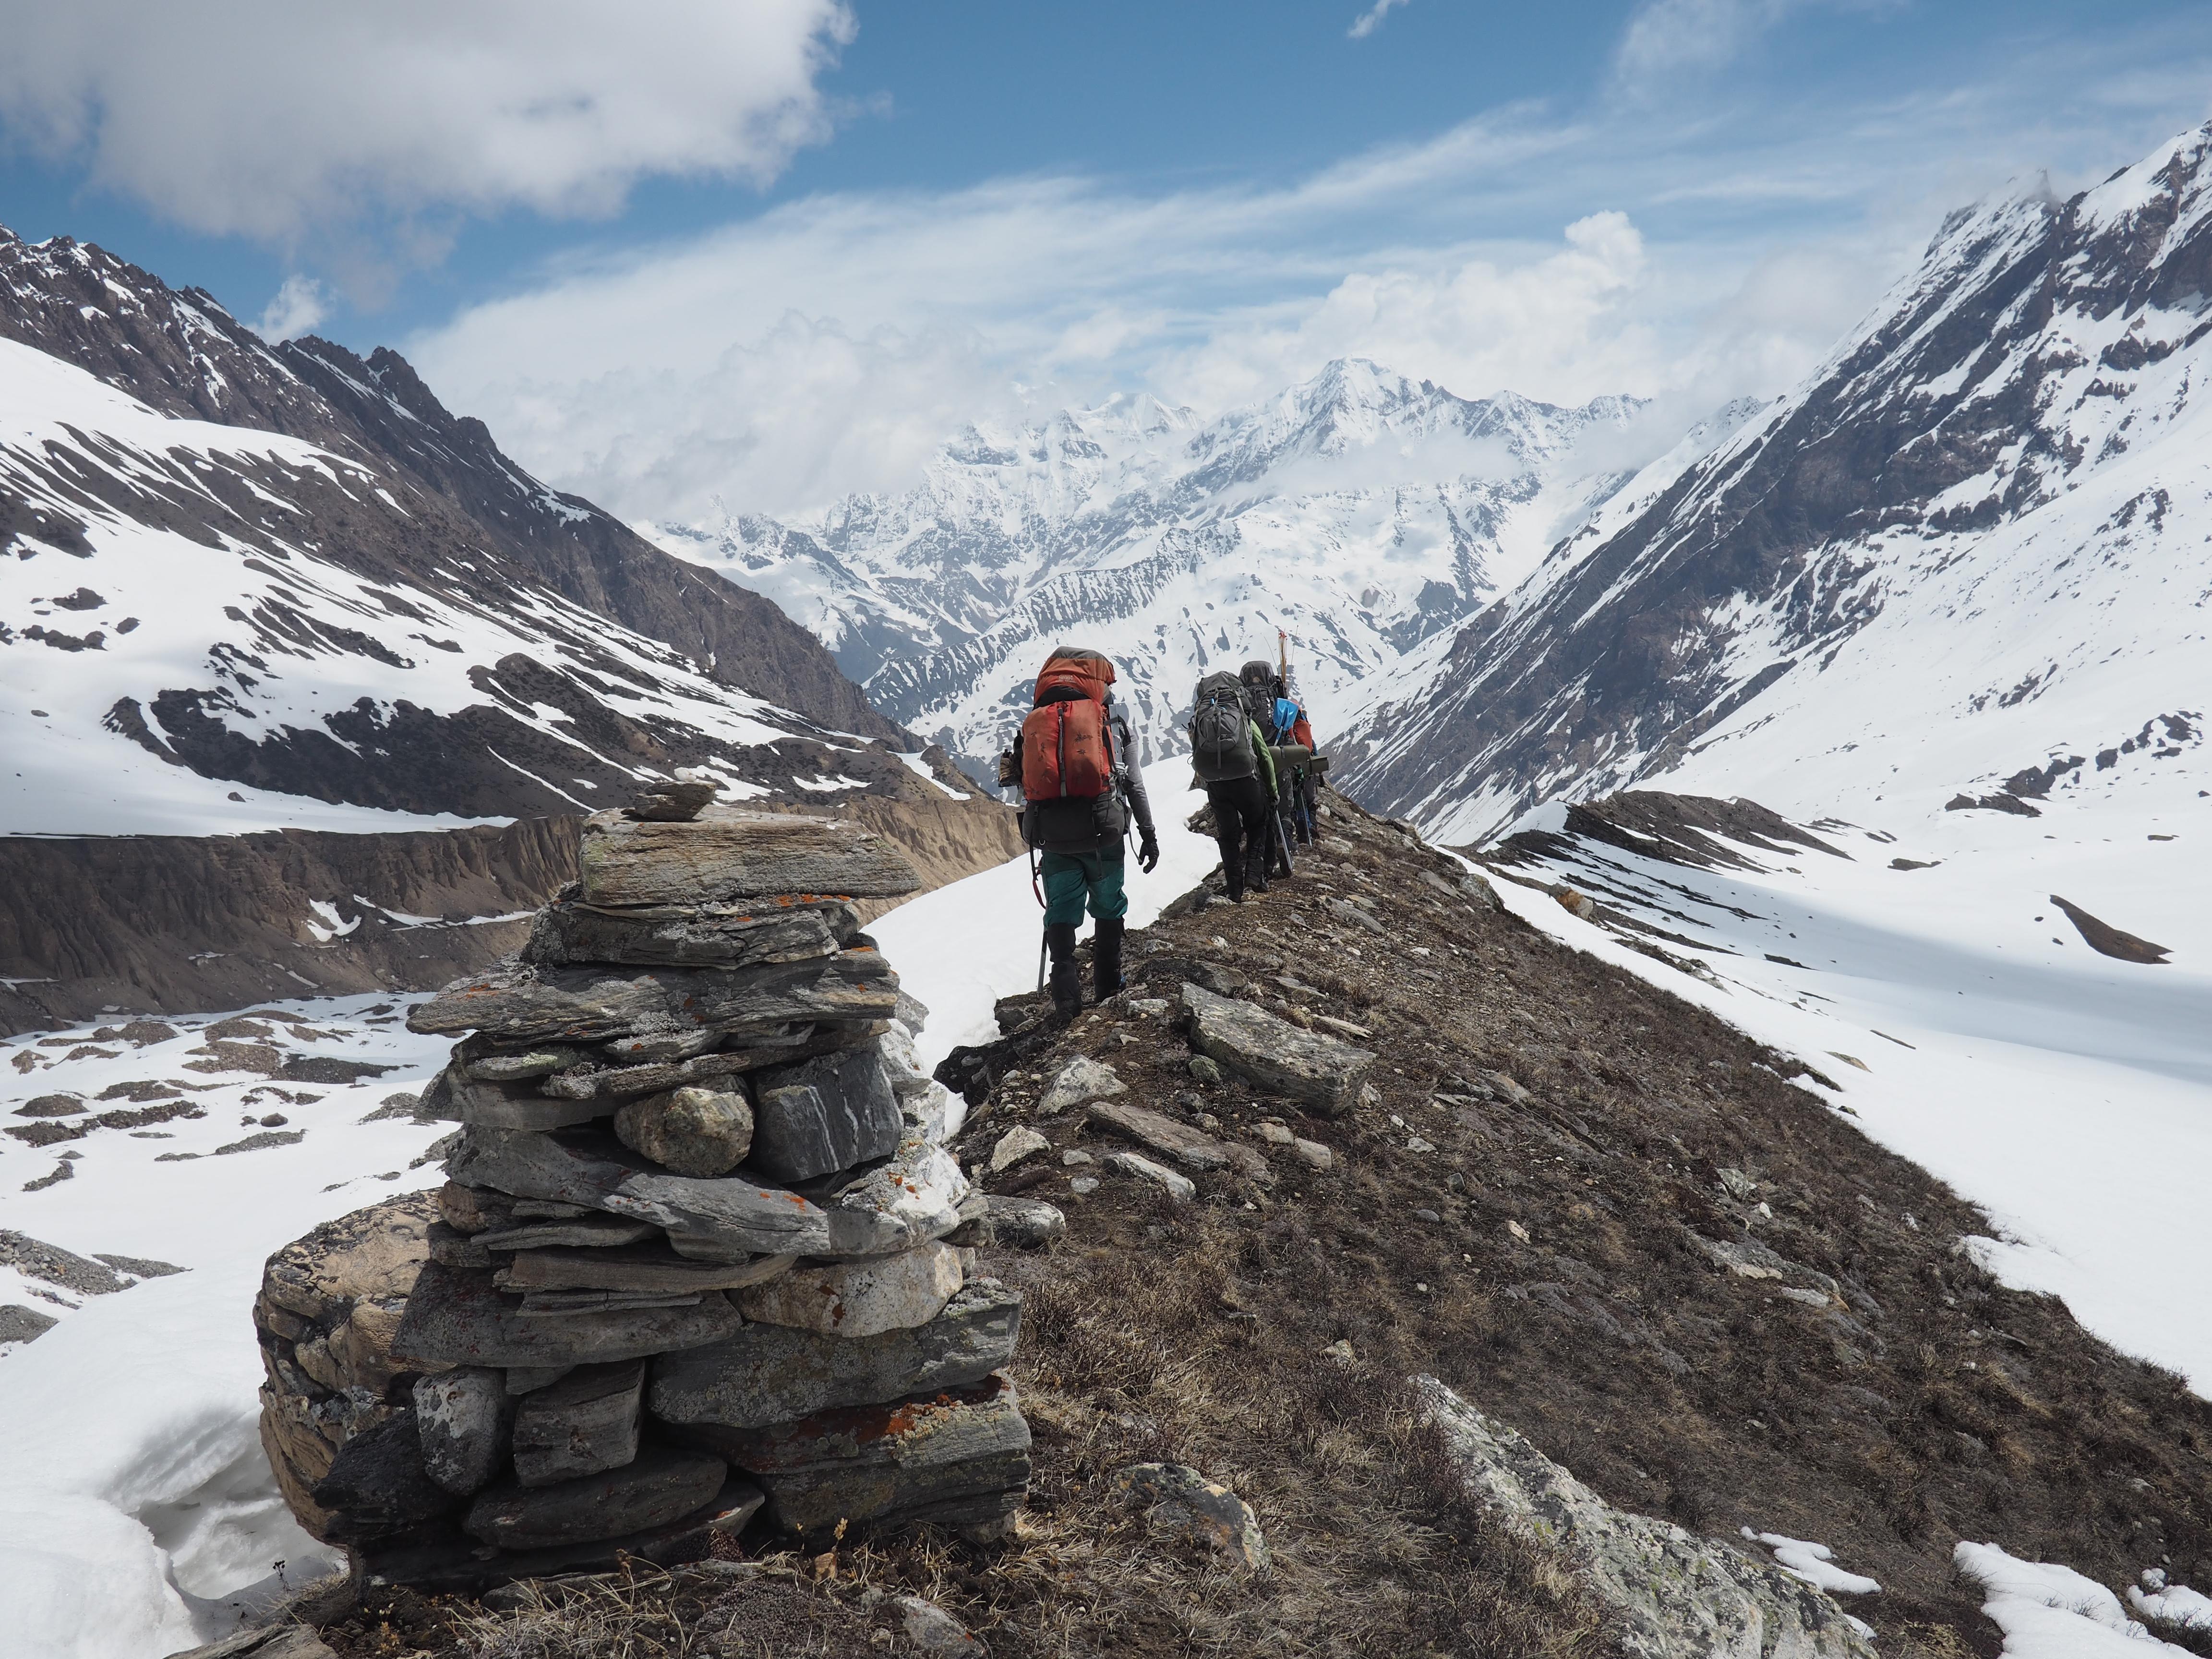 Gap Year Program - NOLS India Trip Leader  3